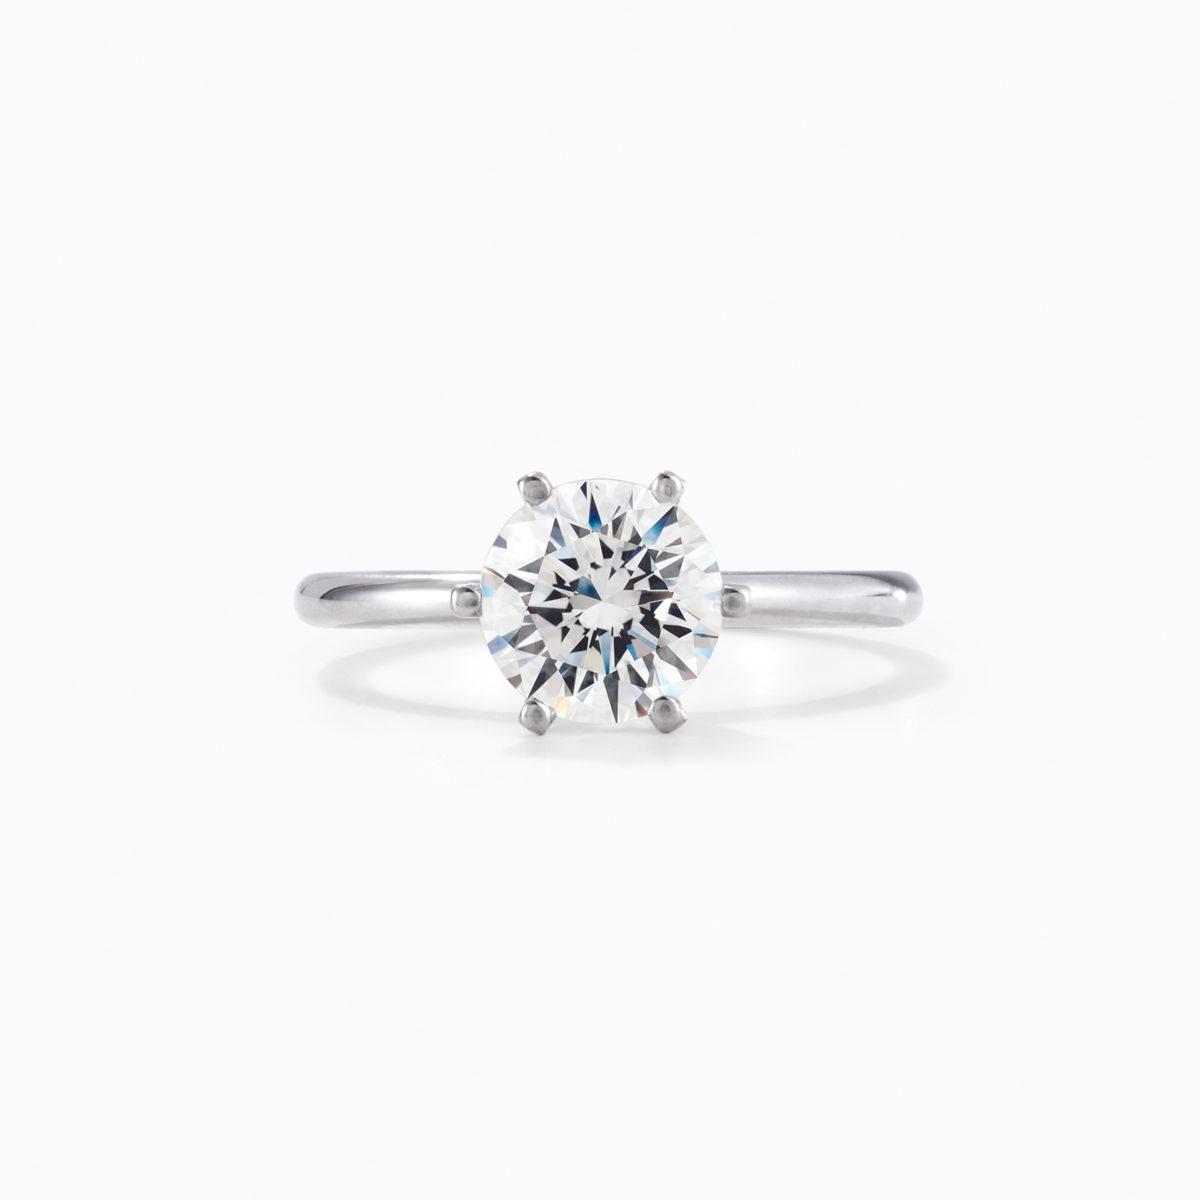 Ludbrook-for-Bensimon-Diamonds-02